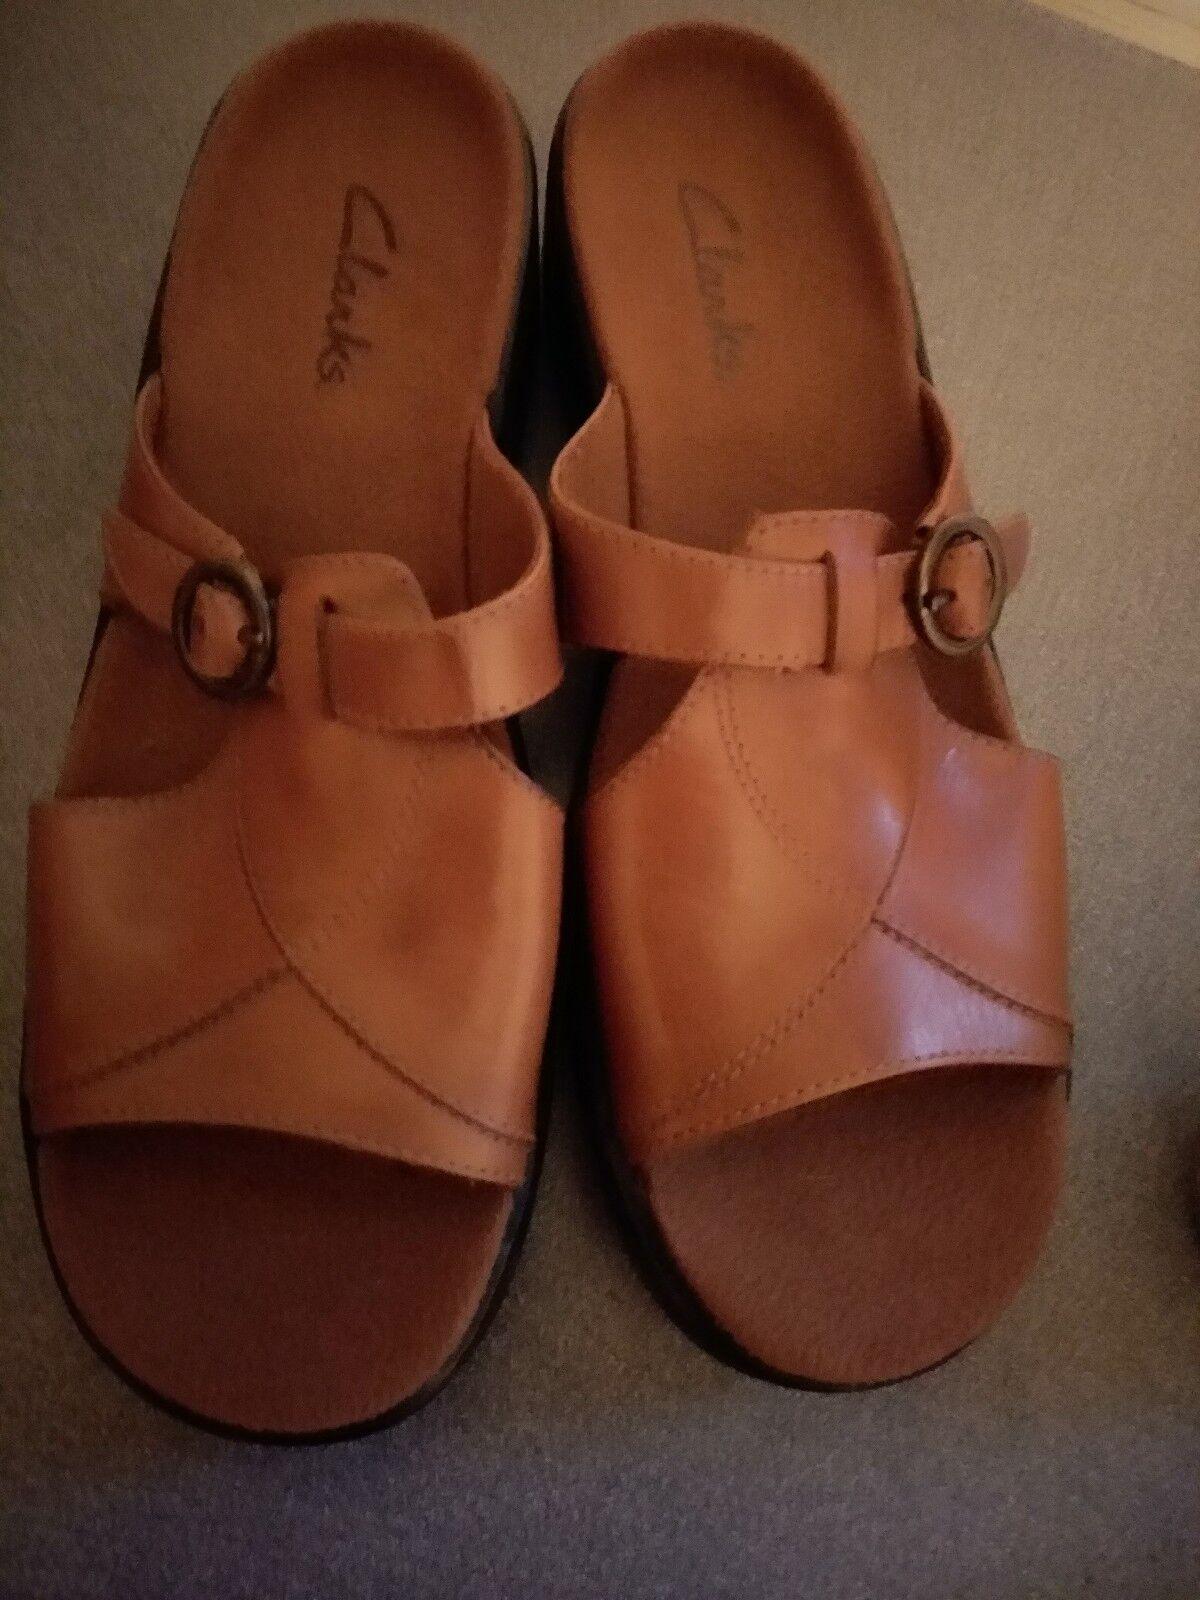 NWOT Damenschuhe Clarks Braun Leder Sandale Made in Brazil slide Open Toe Größe 9M